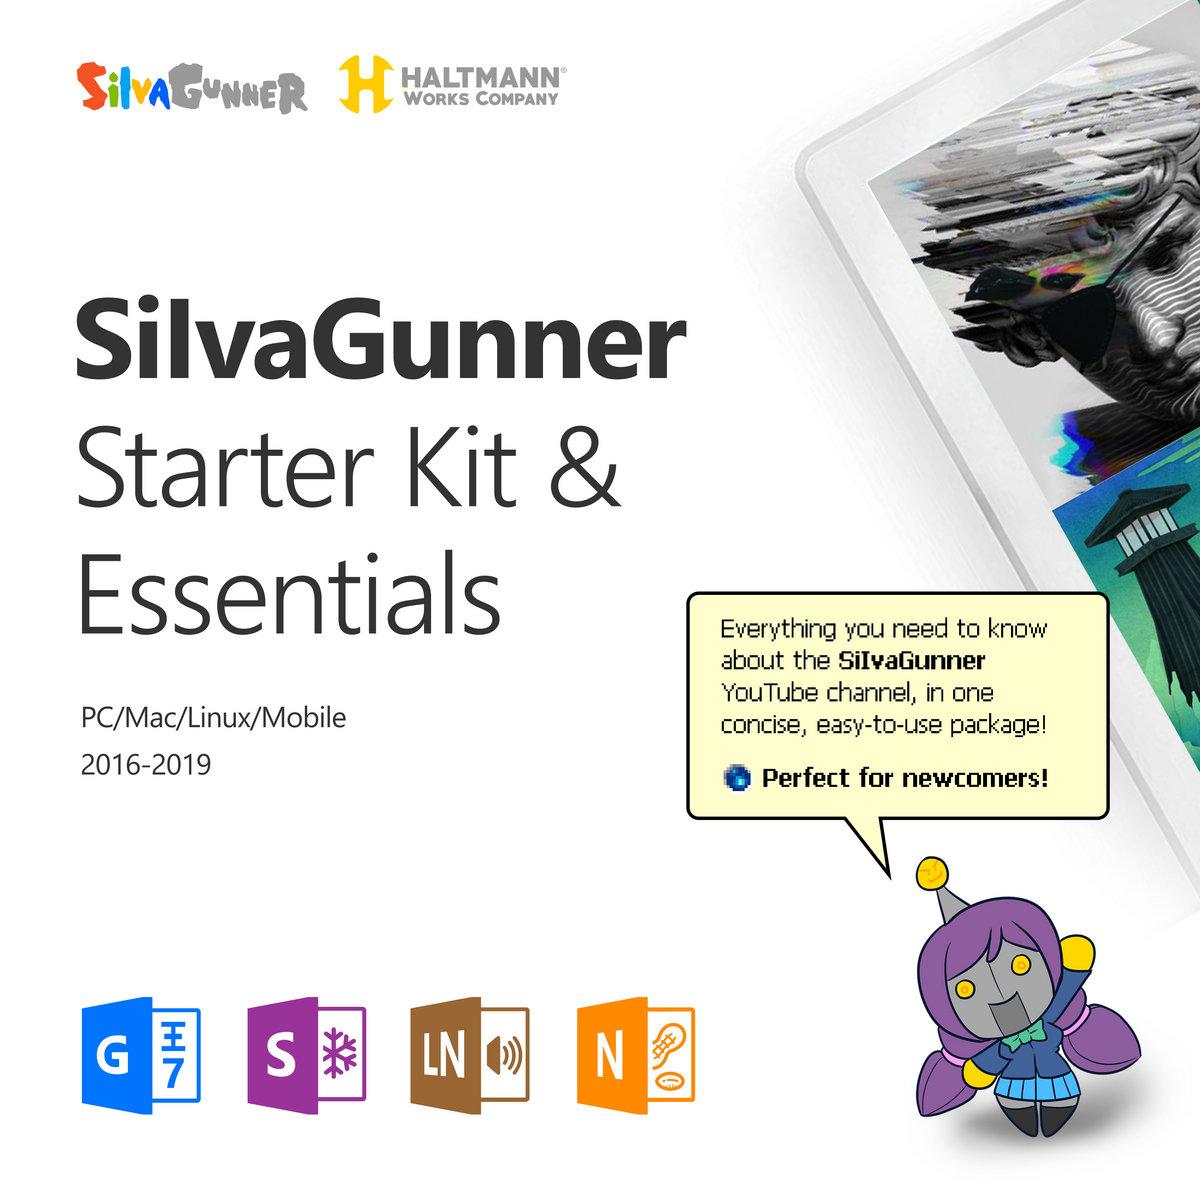 SiIvaGunner: Starter Kit & Essentials   GilvaSunner